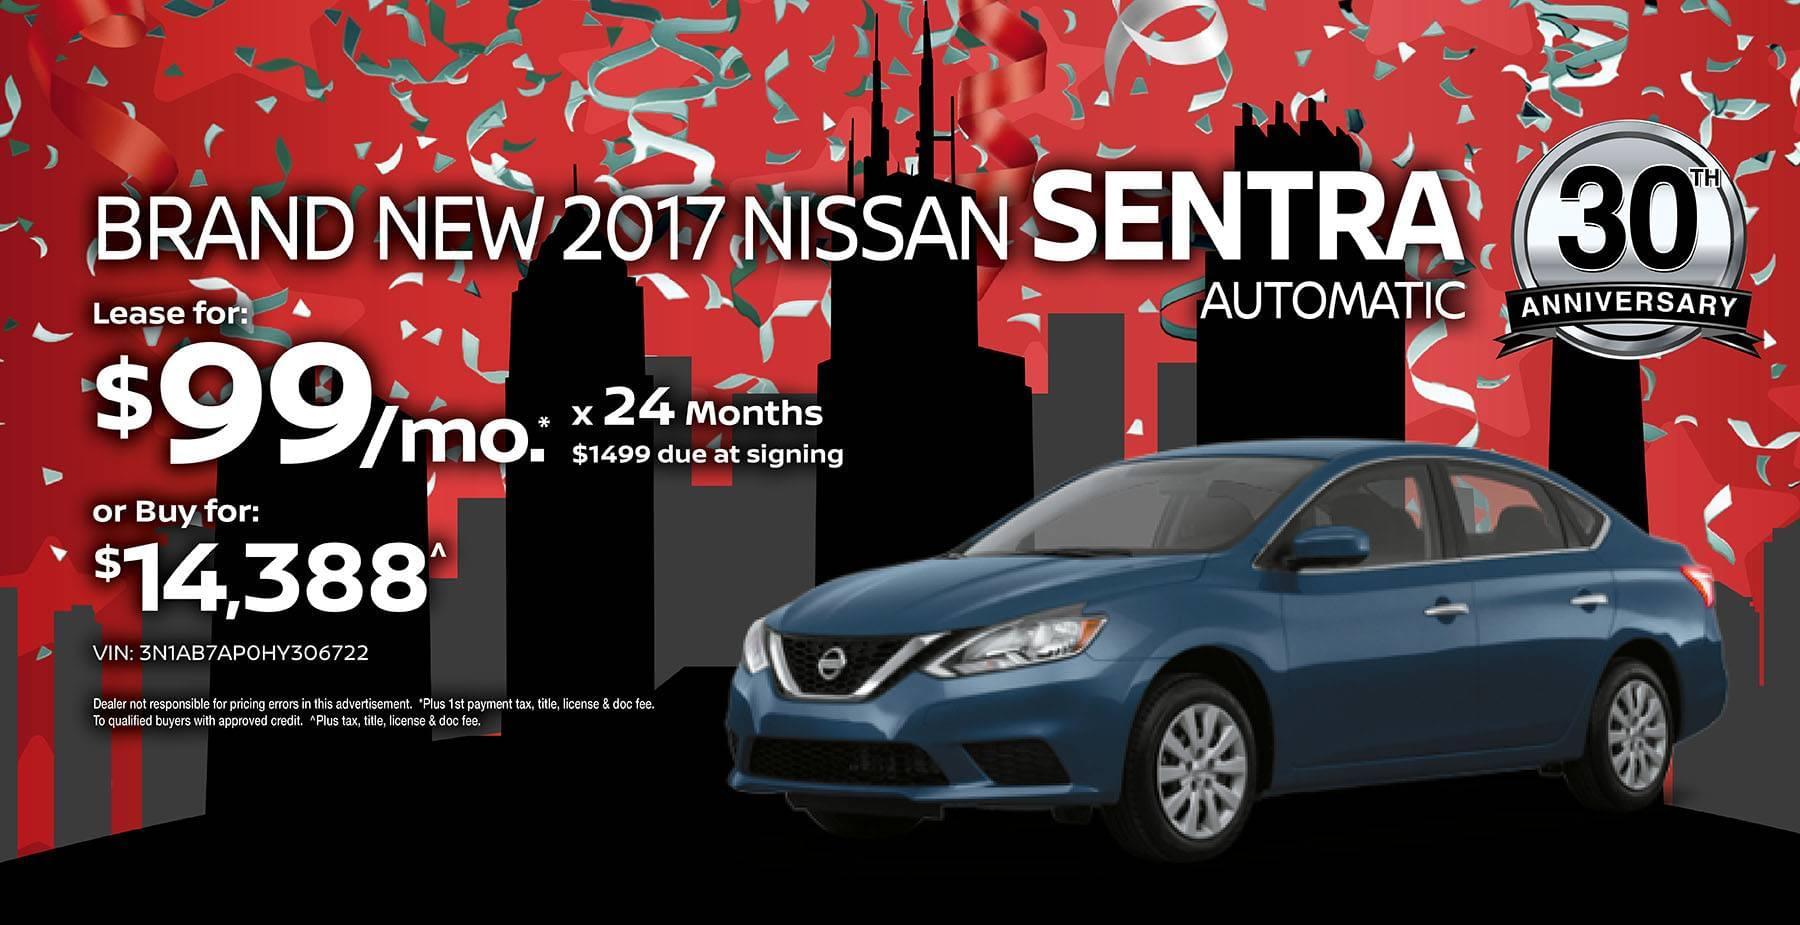 2017 Nissan Altima June Sale at Star Nissan